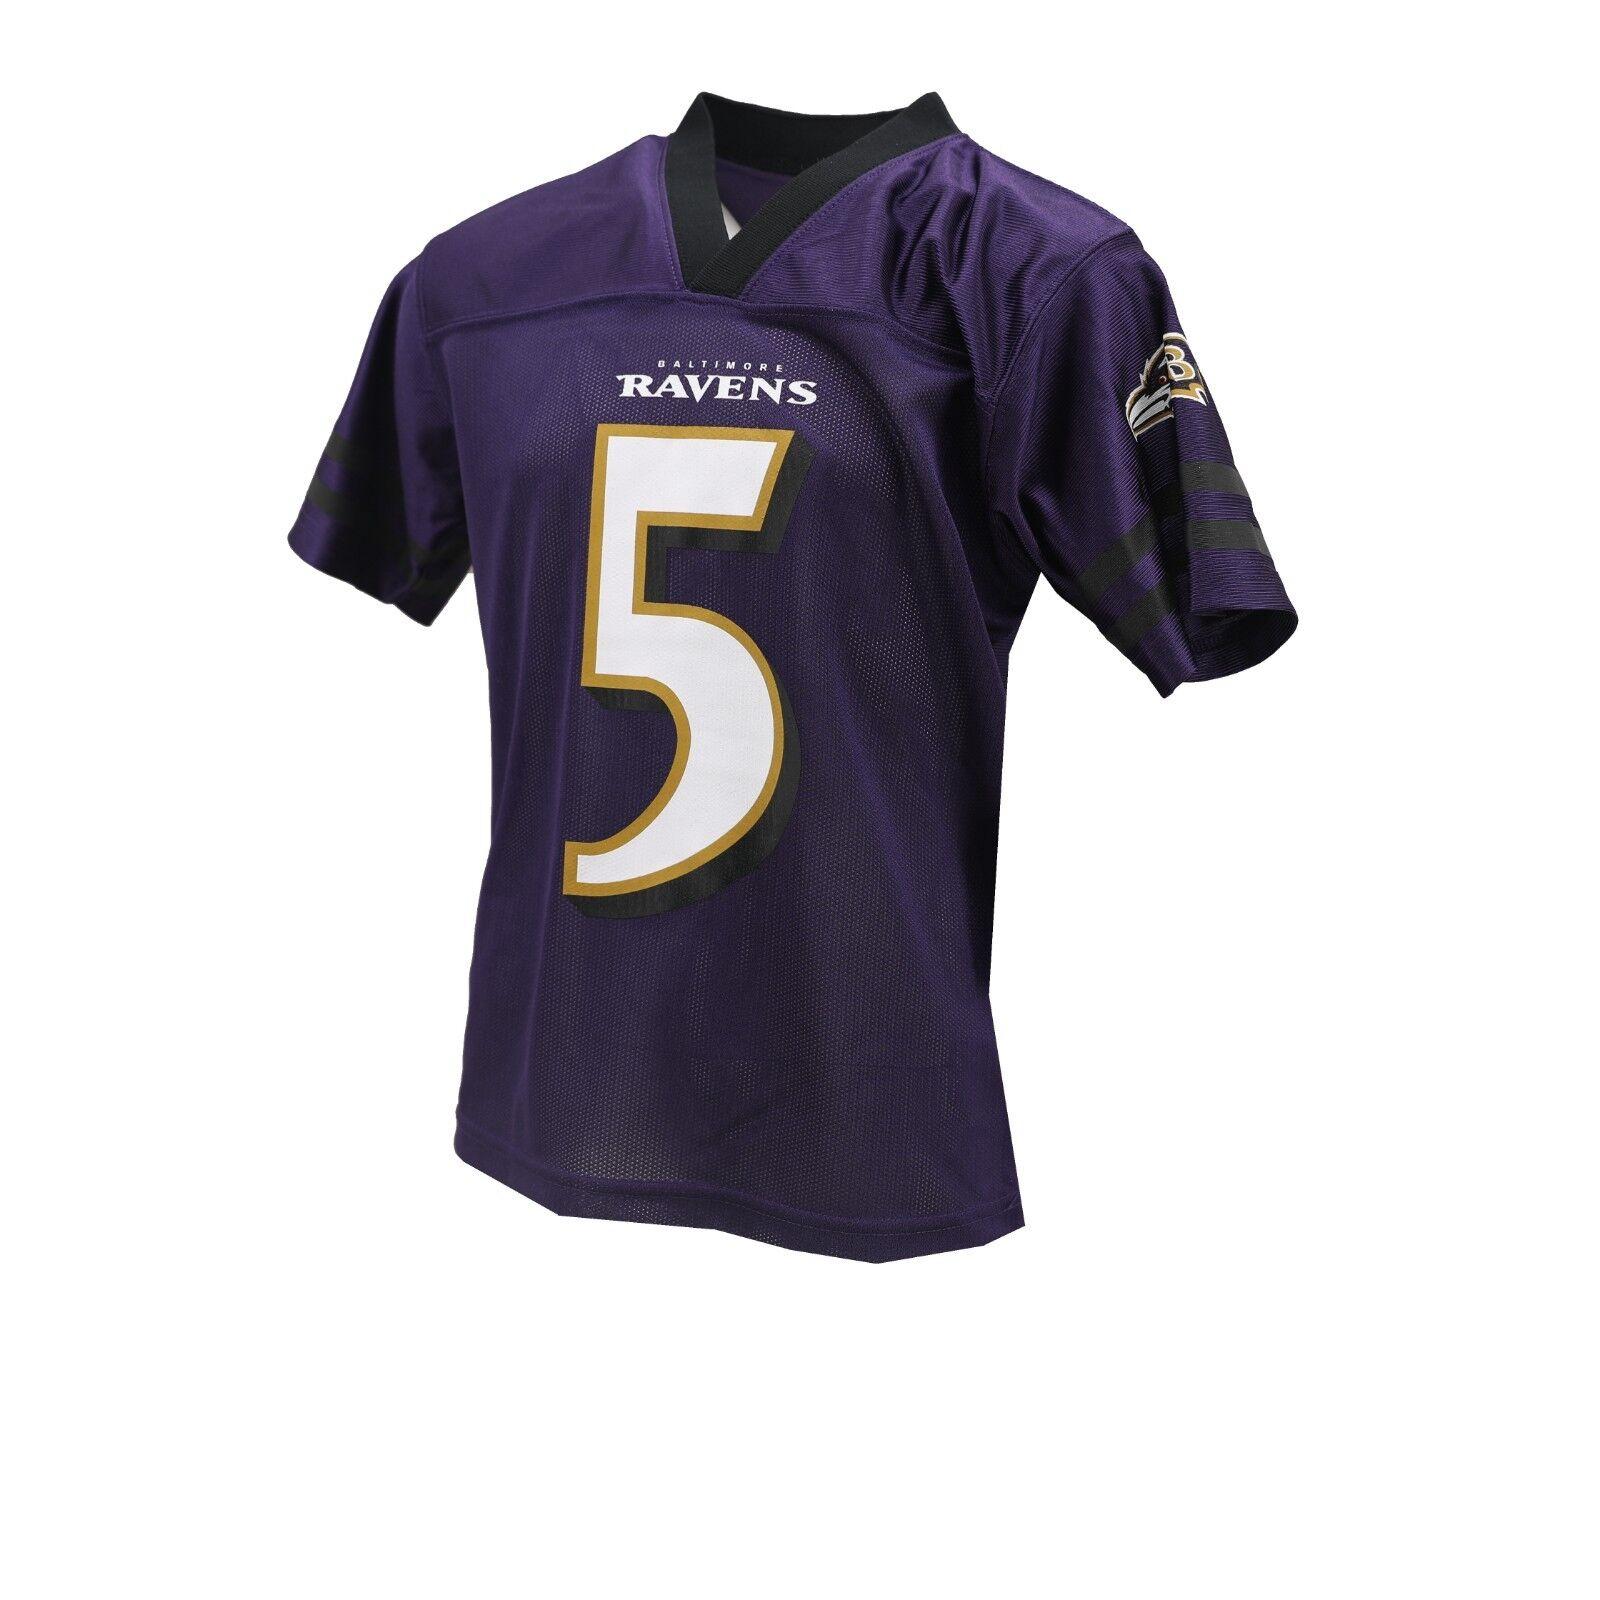 watch 1ffae 06f57 Baltimore Ravens Official NFL Apparel Kids Youth Size Joe ...